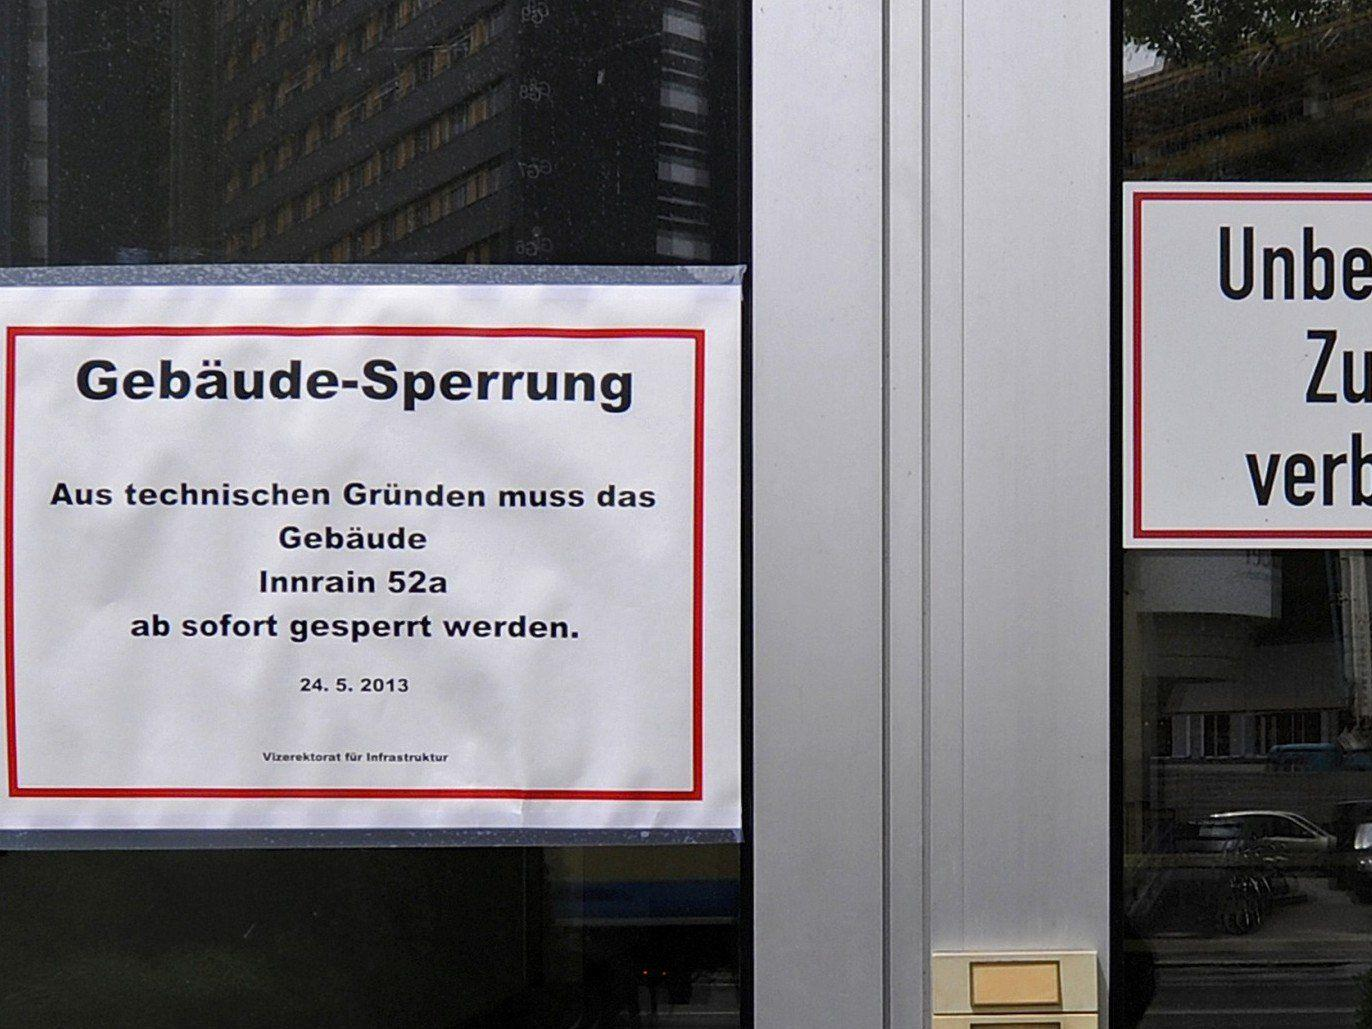 Radioaktive Strahlung in Innsbrucker Uni-Gebäude